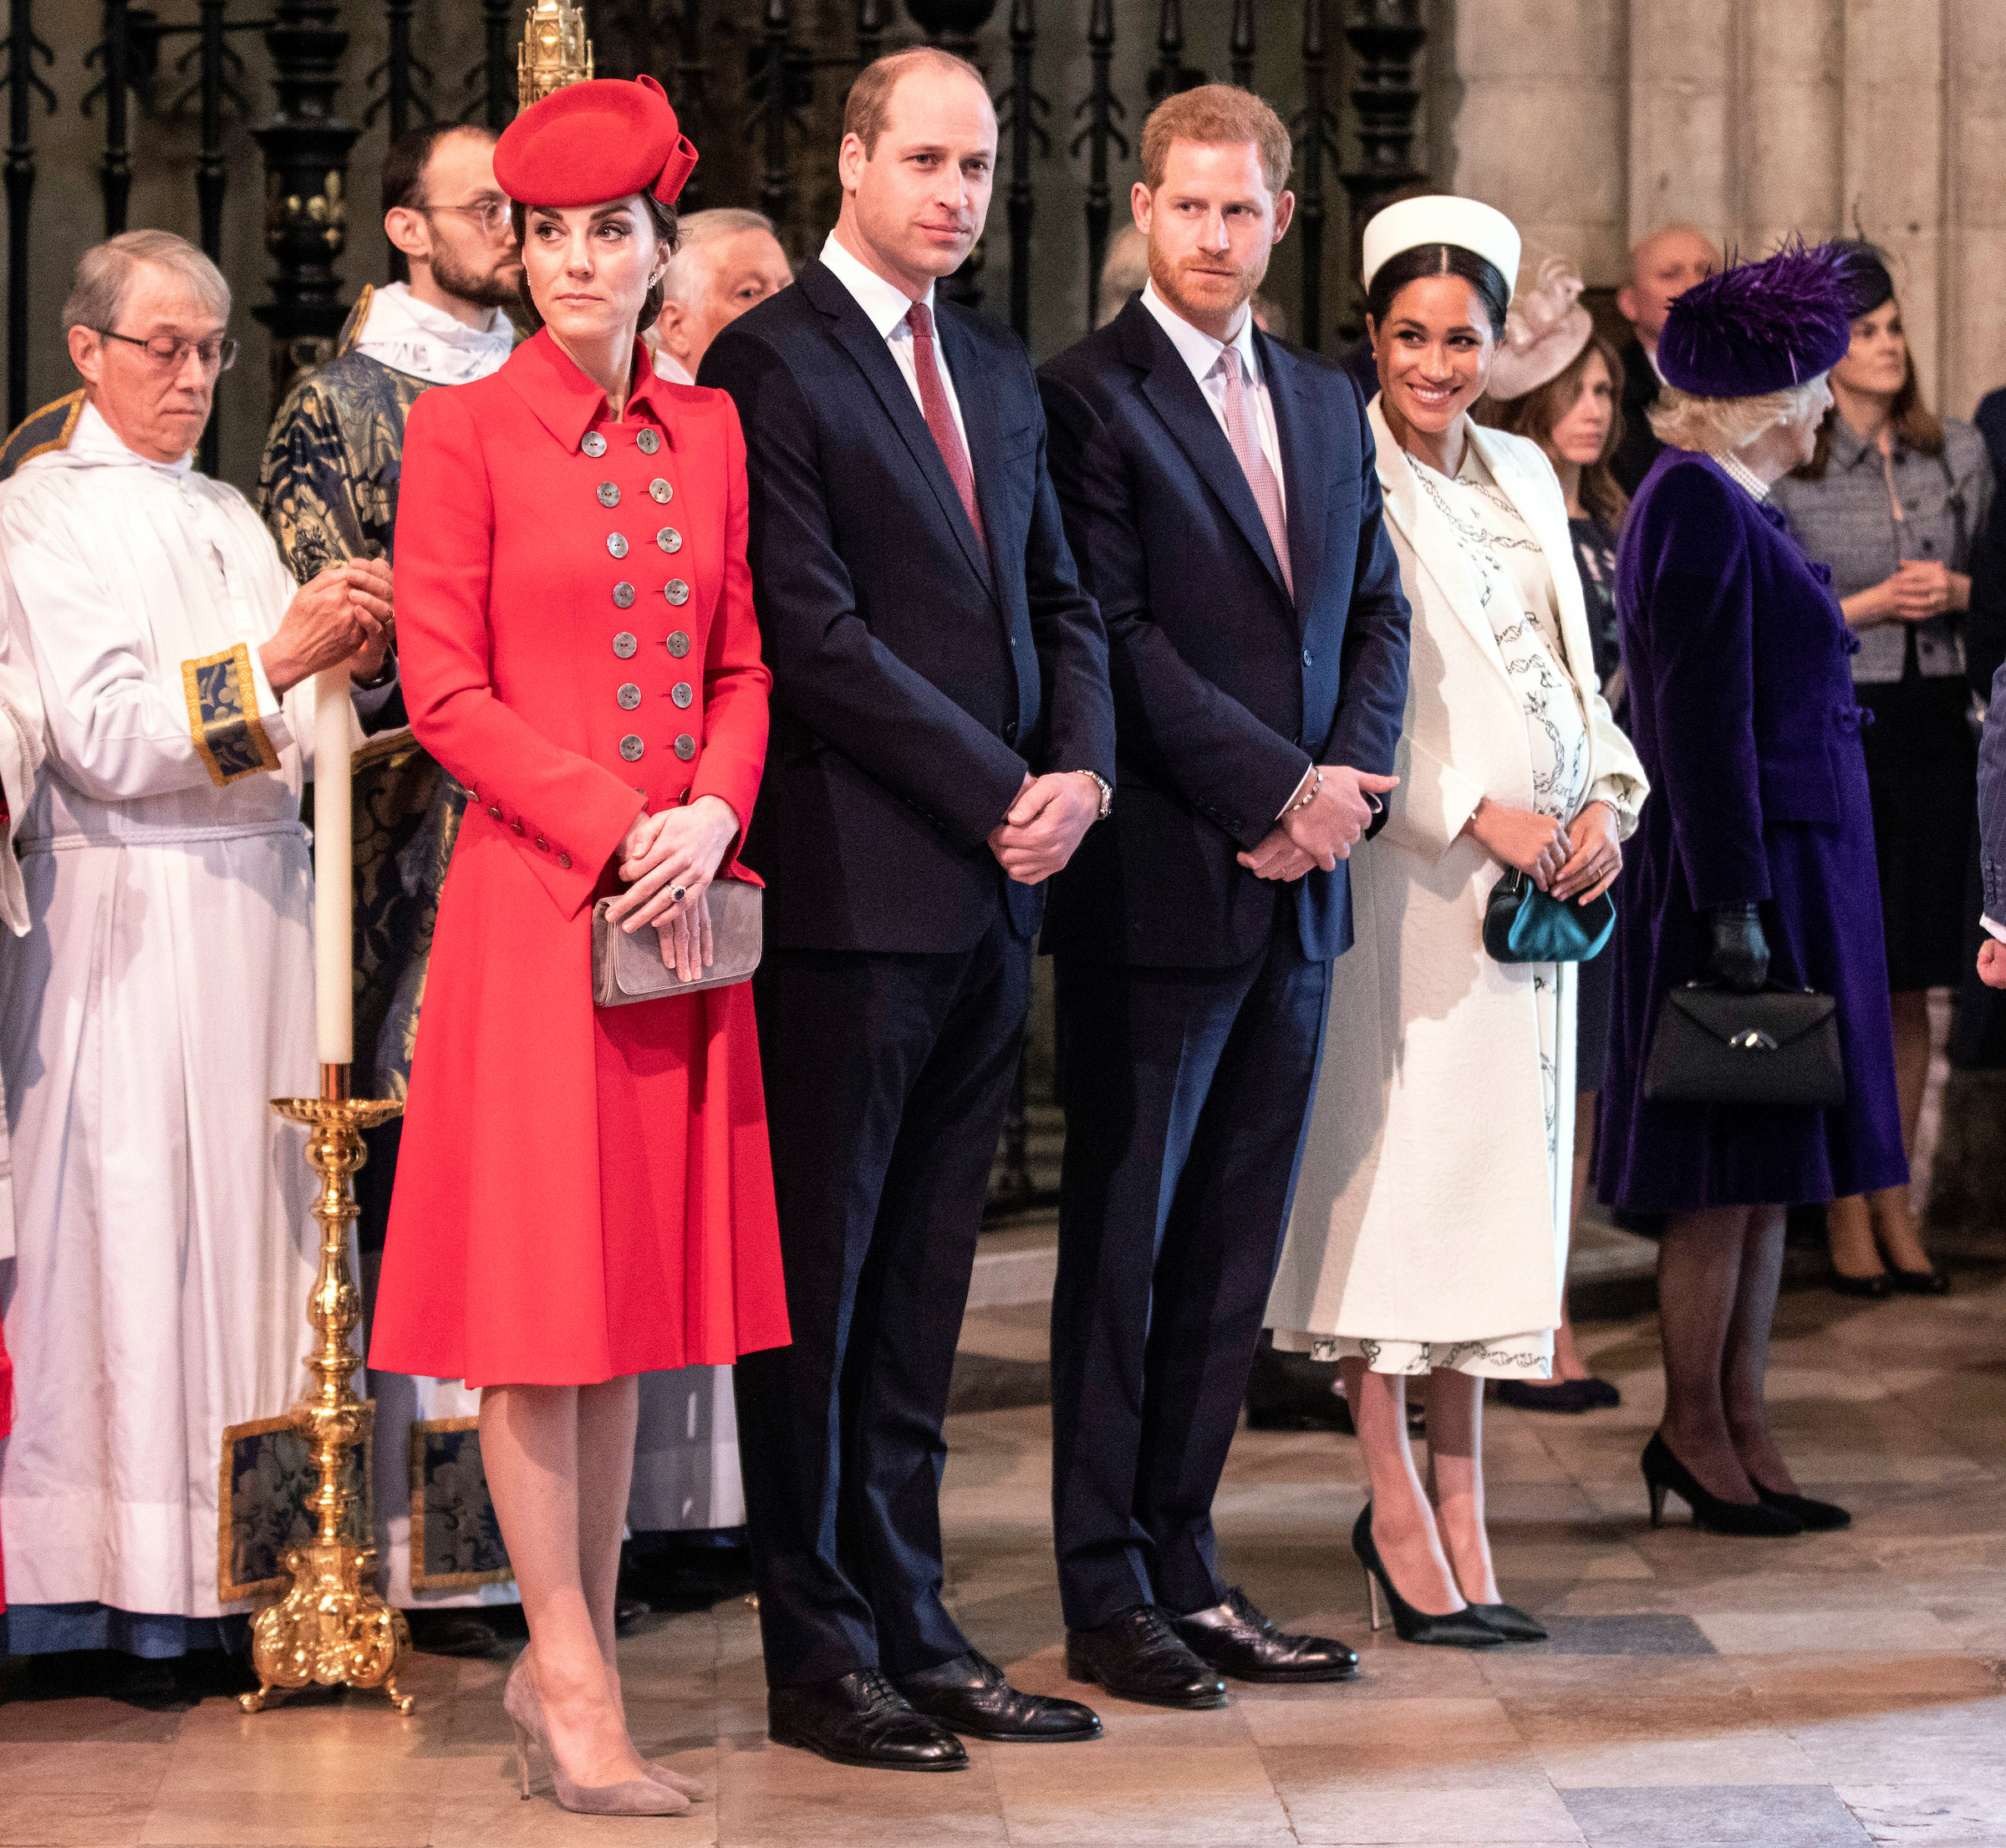 Kate Middleton, prințul William, prințul Harry și Meghan Markle